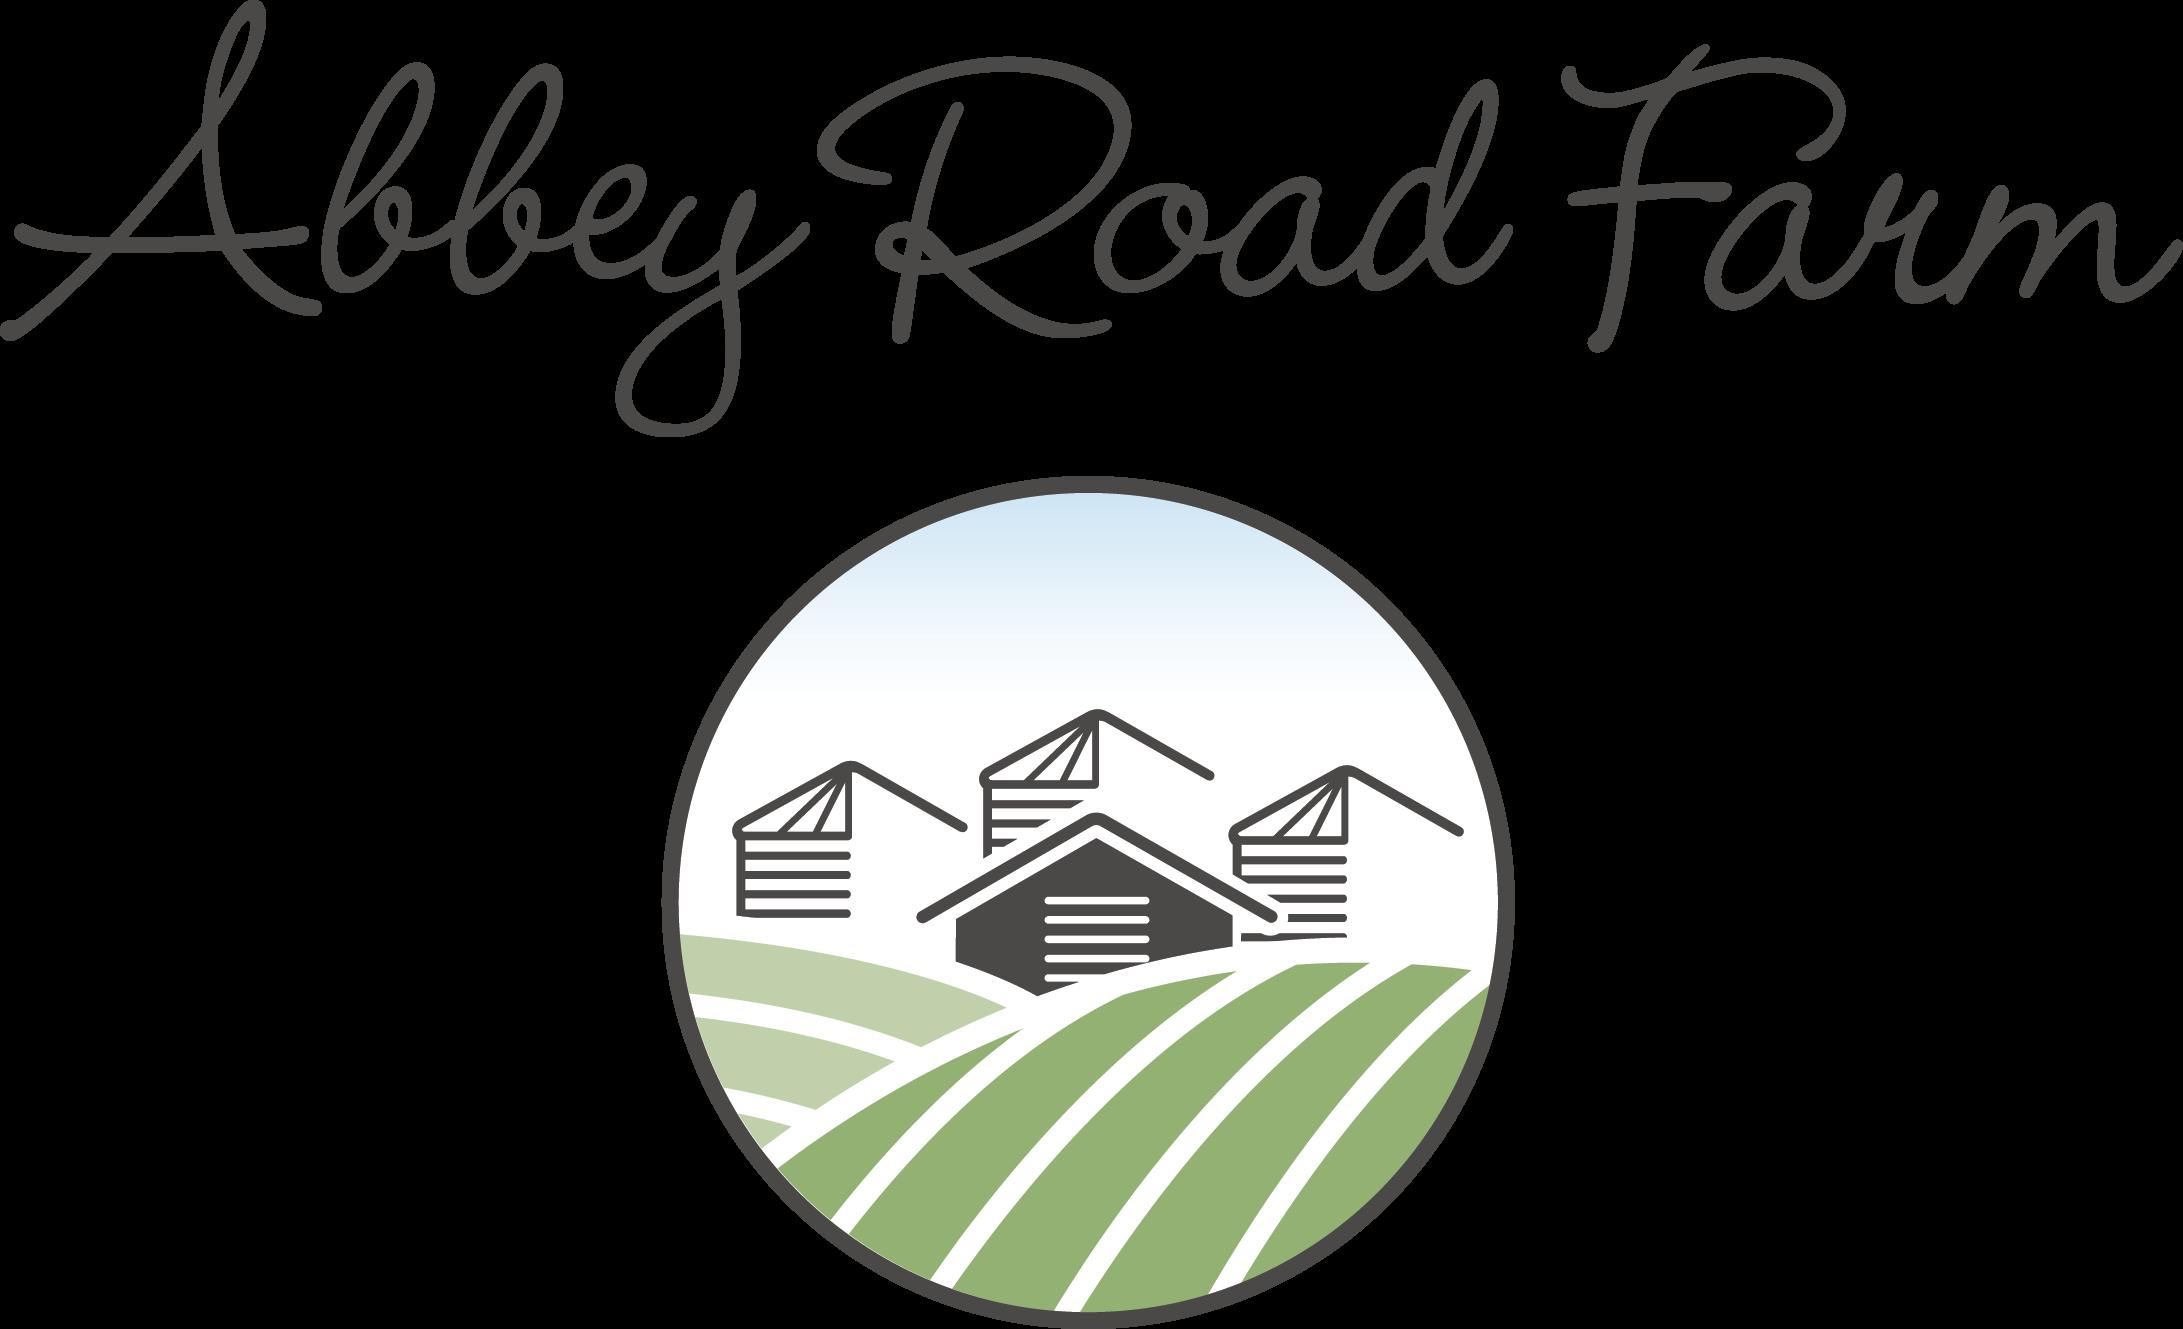 Abbey Road Farm.png